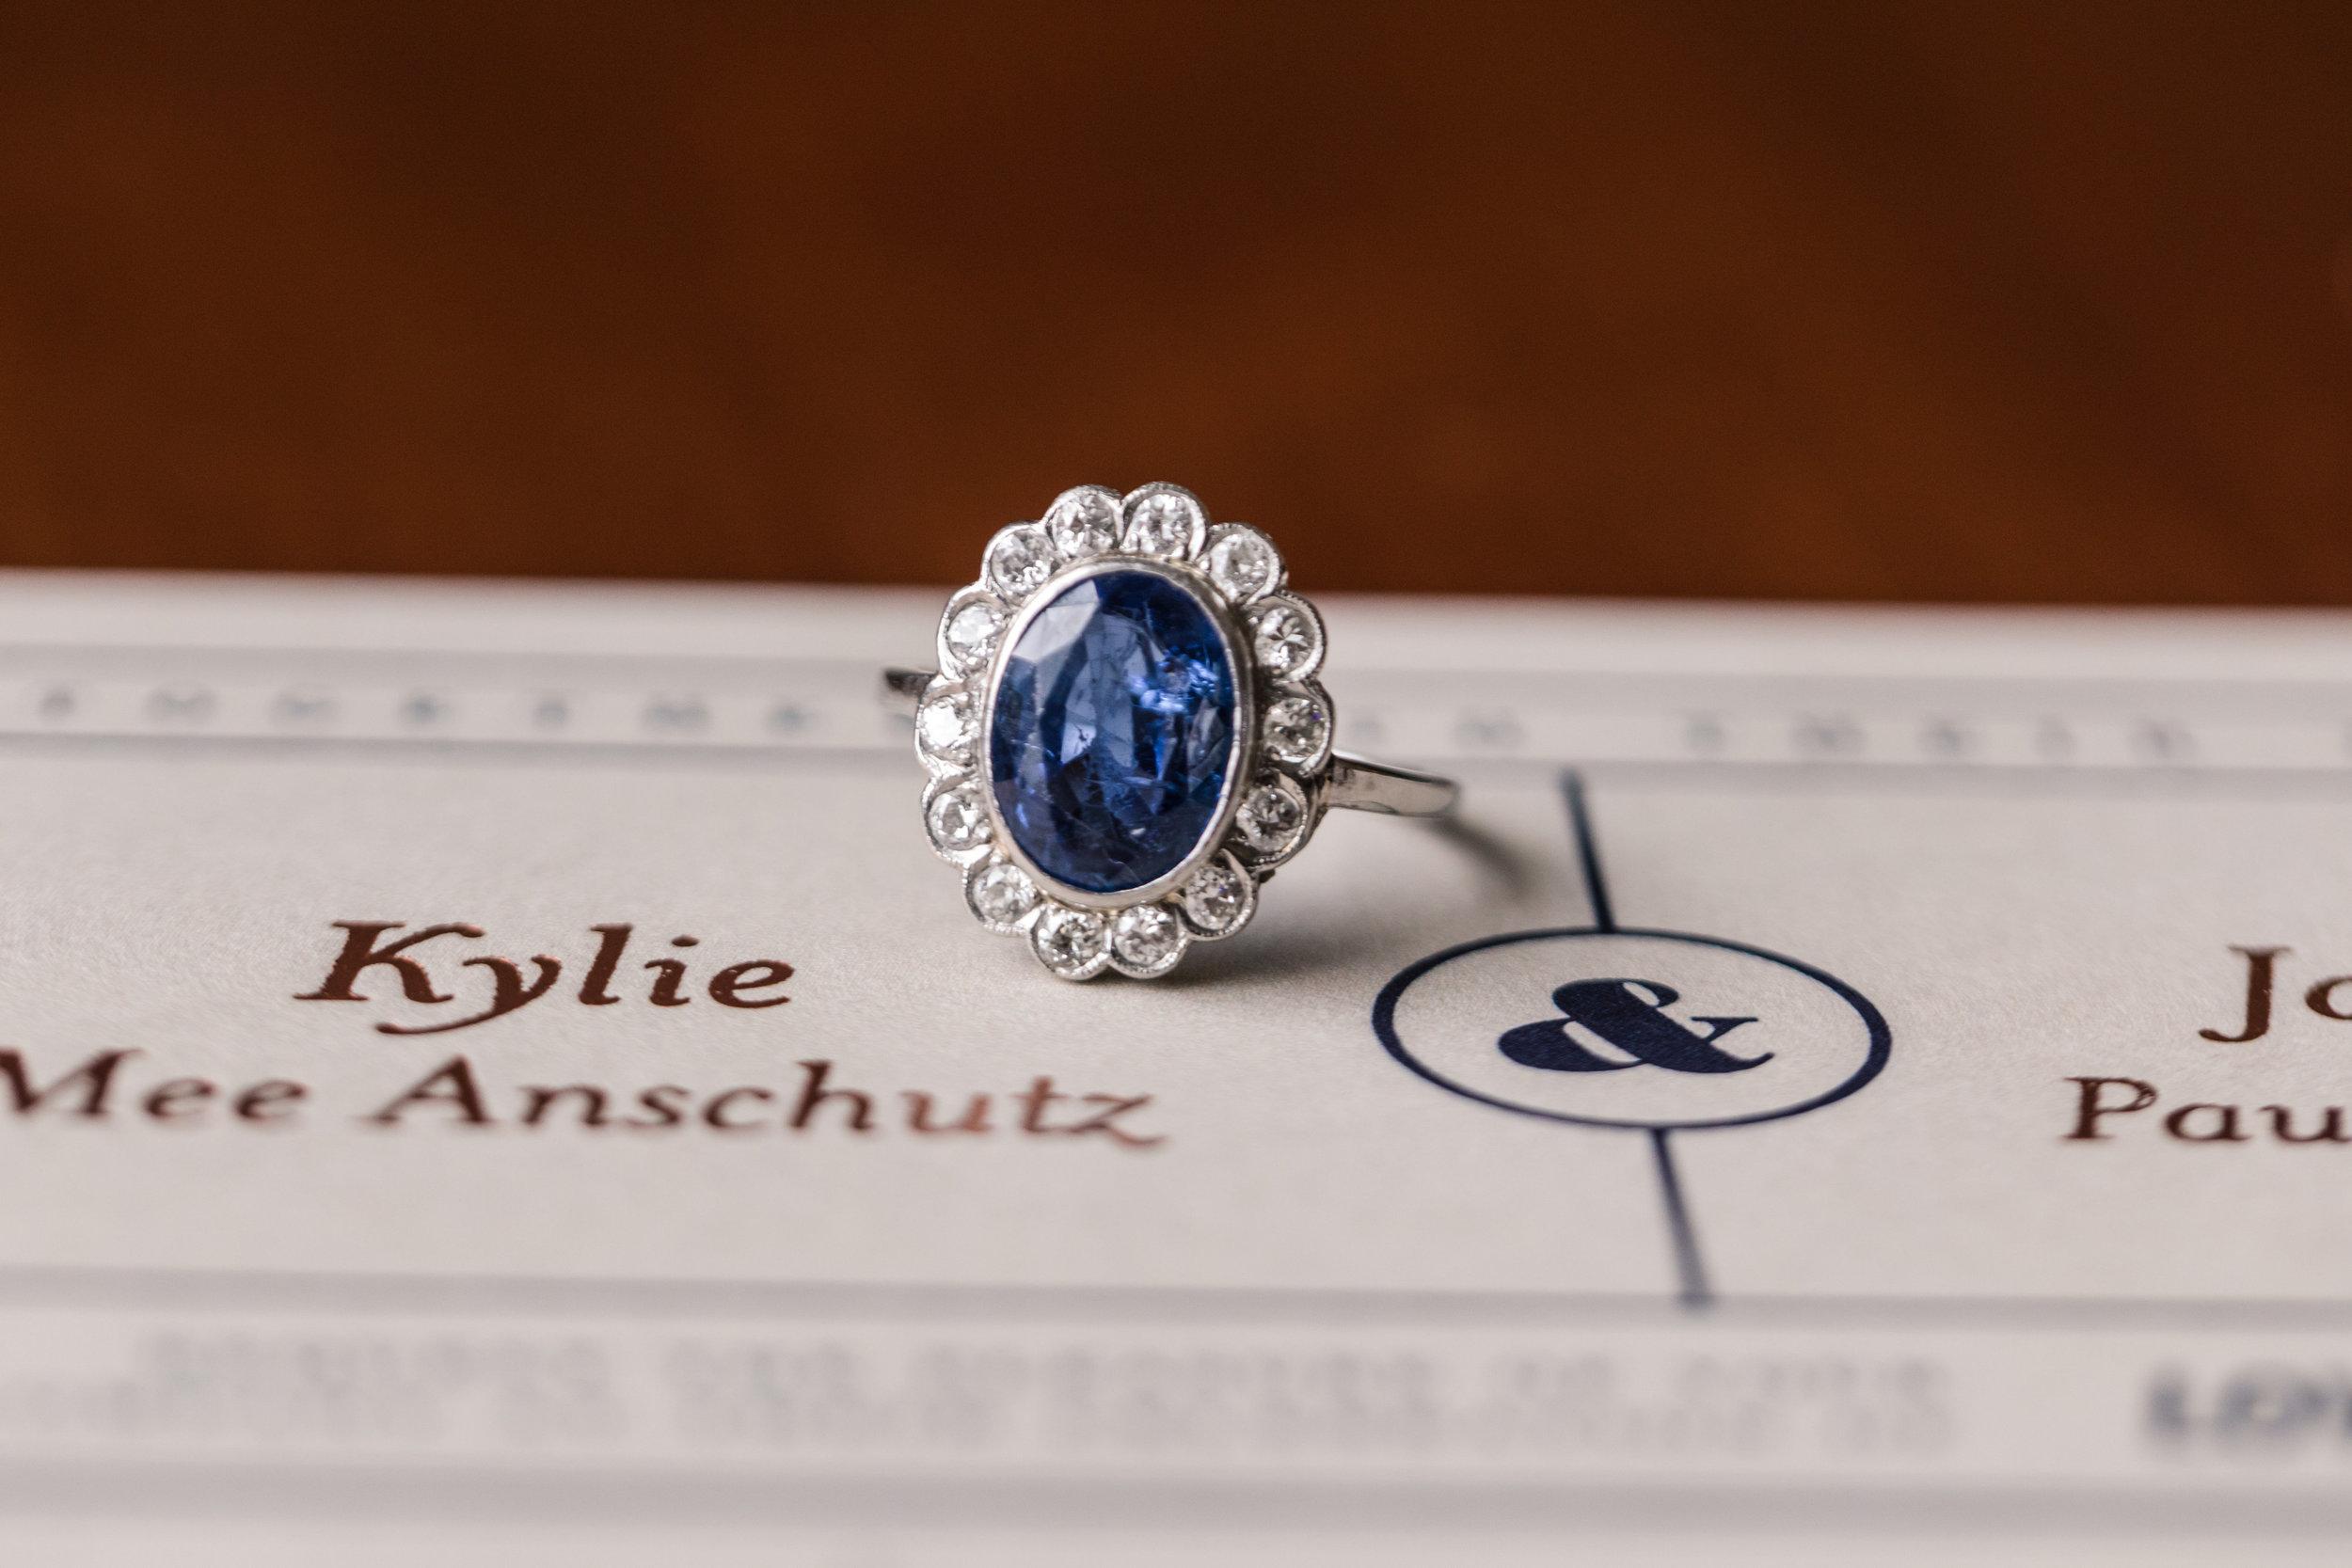 Blue Halo Vintage Engagement Ring - A Classic George Washington Hotel Wedding - Photography by Marirosa